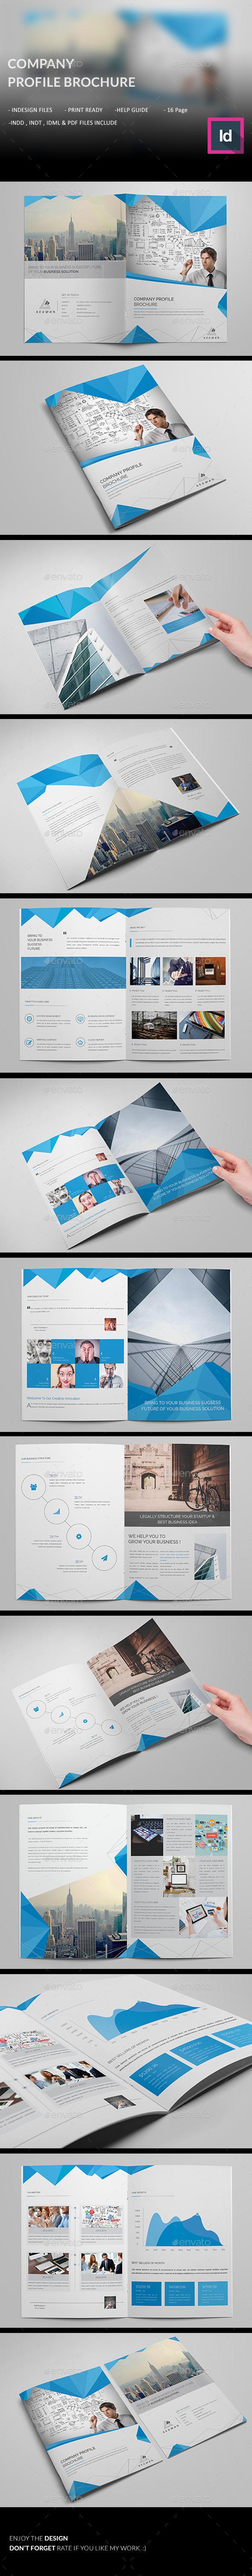 Company Profile Brochure - Corporate Brochures